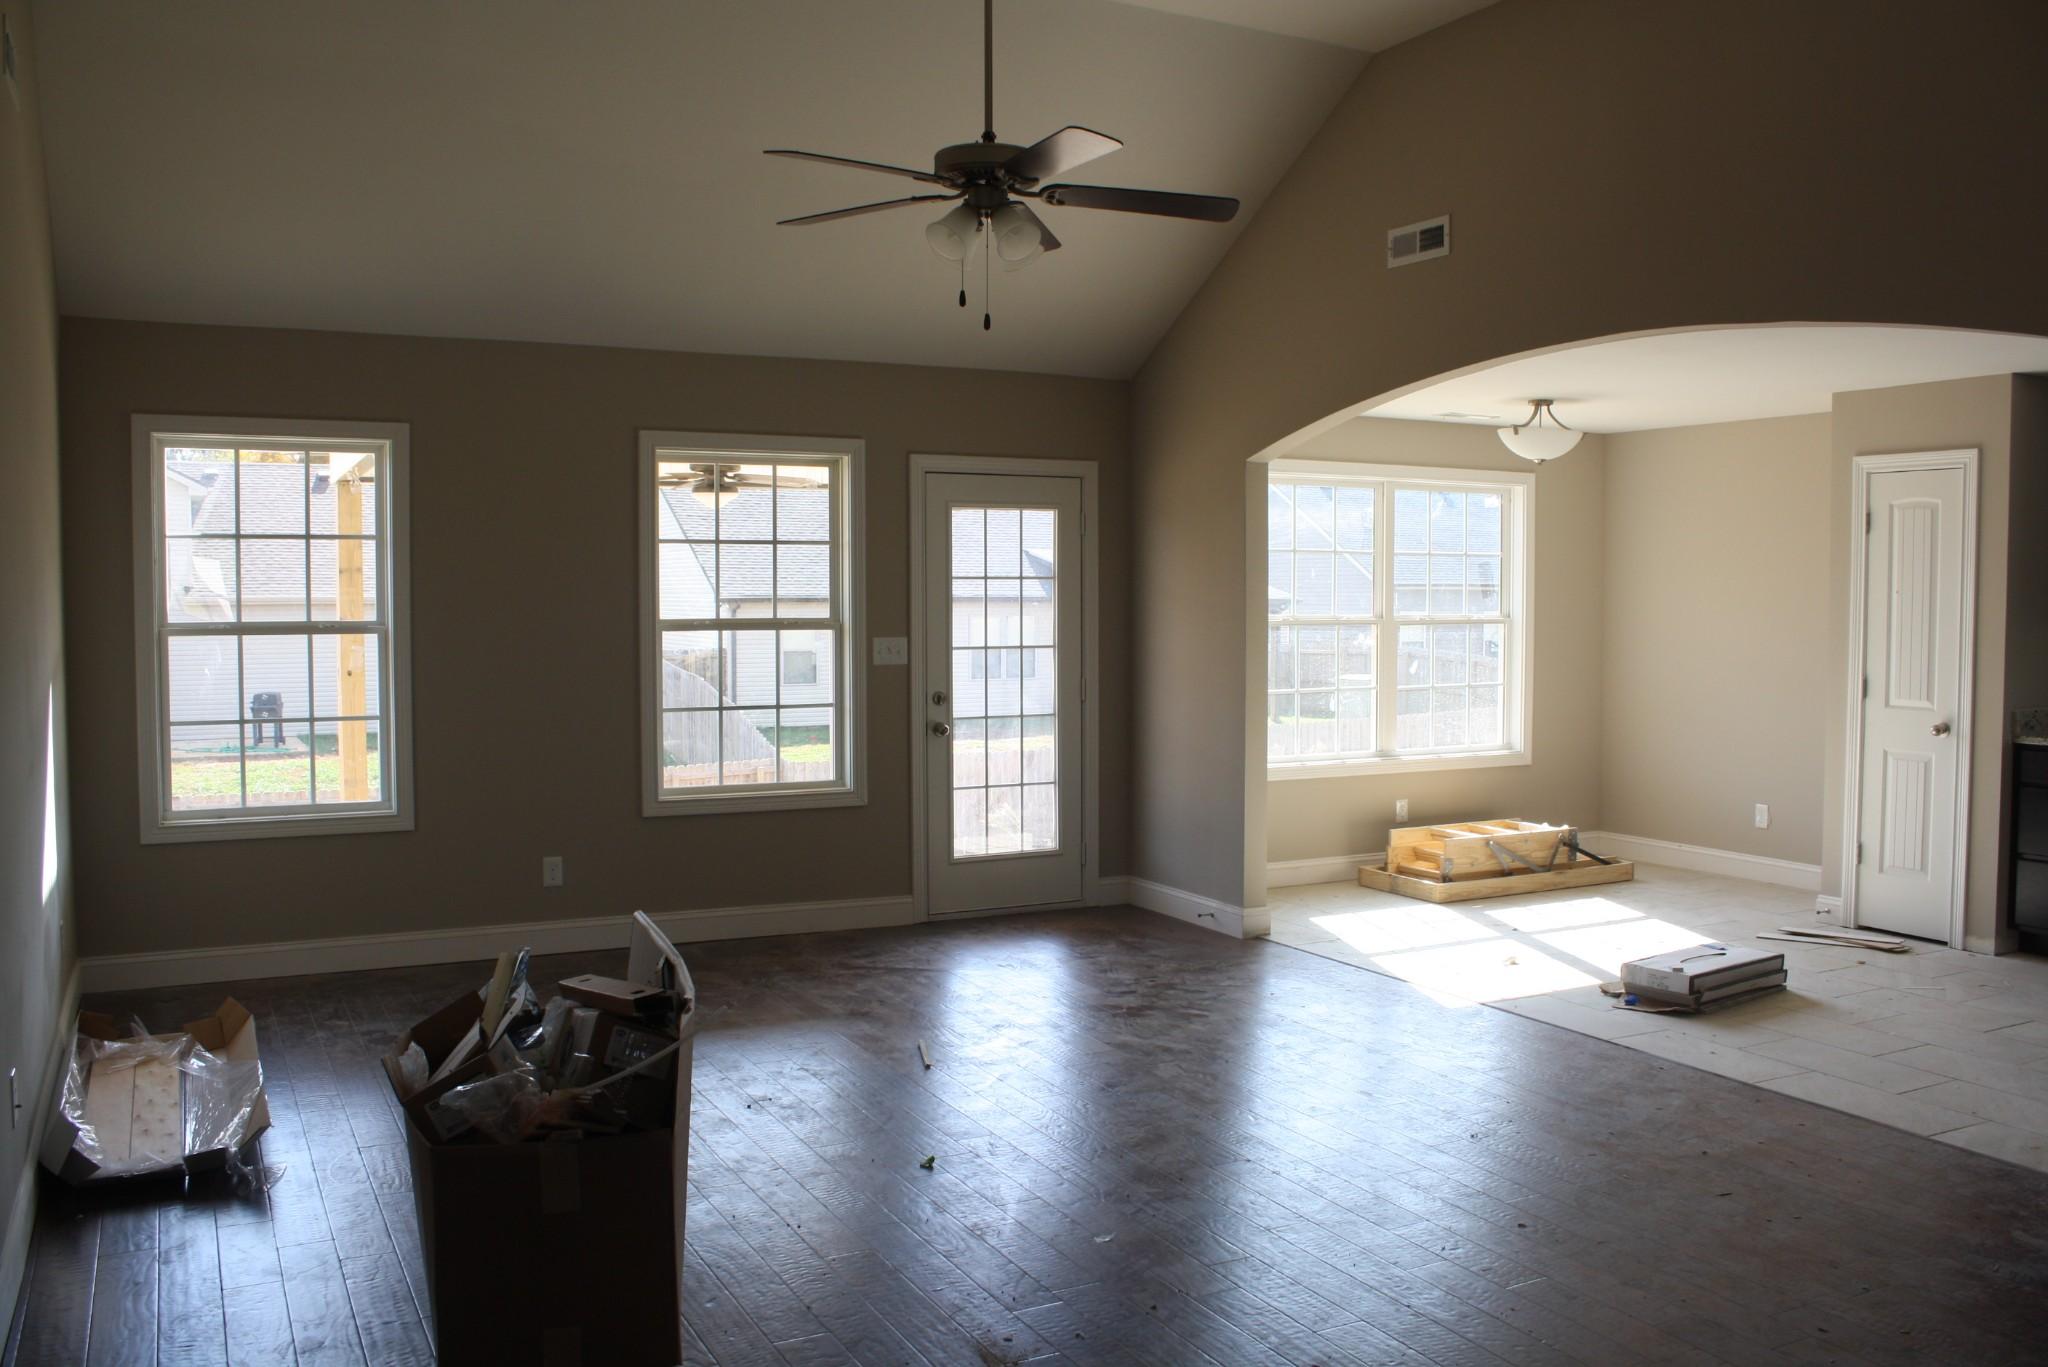 94 Rose Edd Estates, Oak Grove, KY 42262 - Oak Grove, KY real estate listing